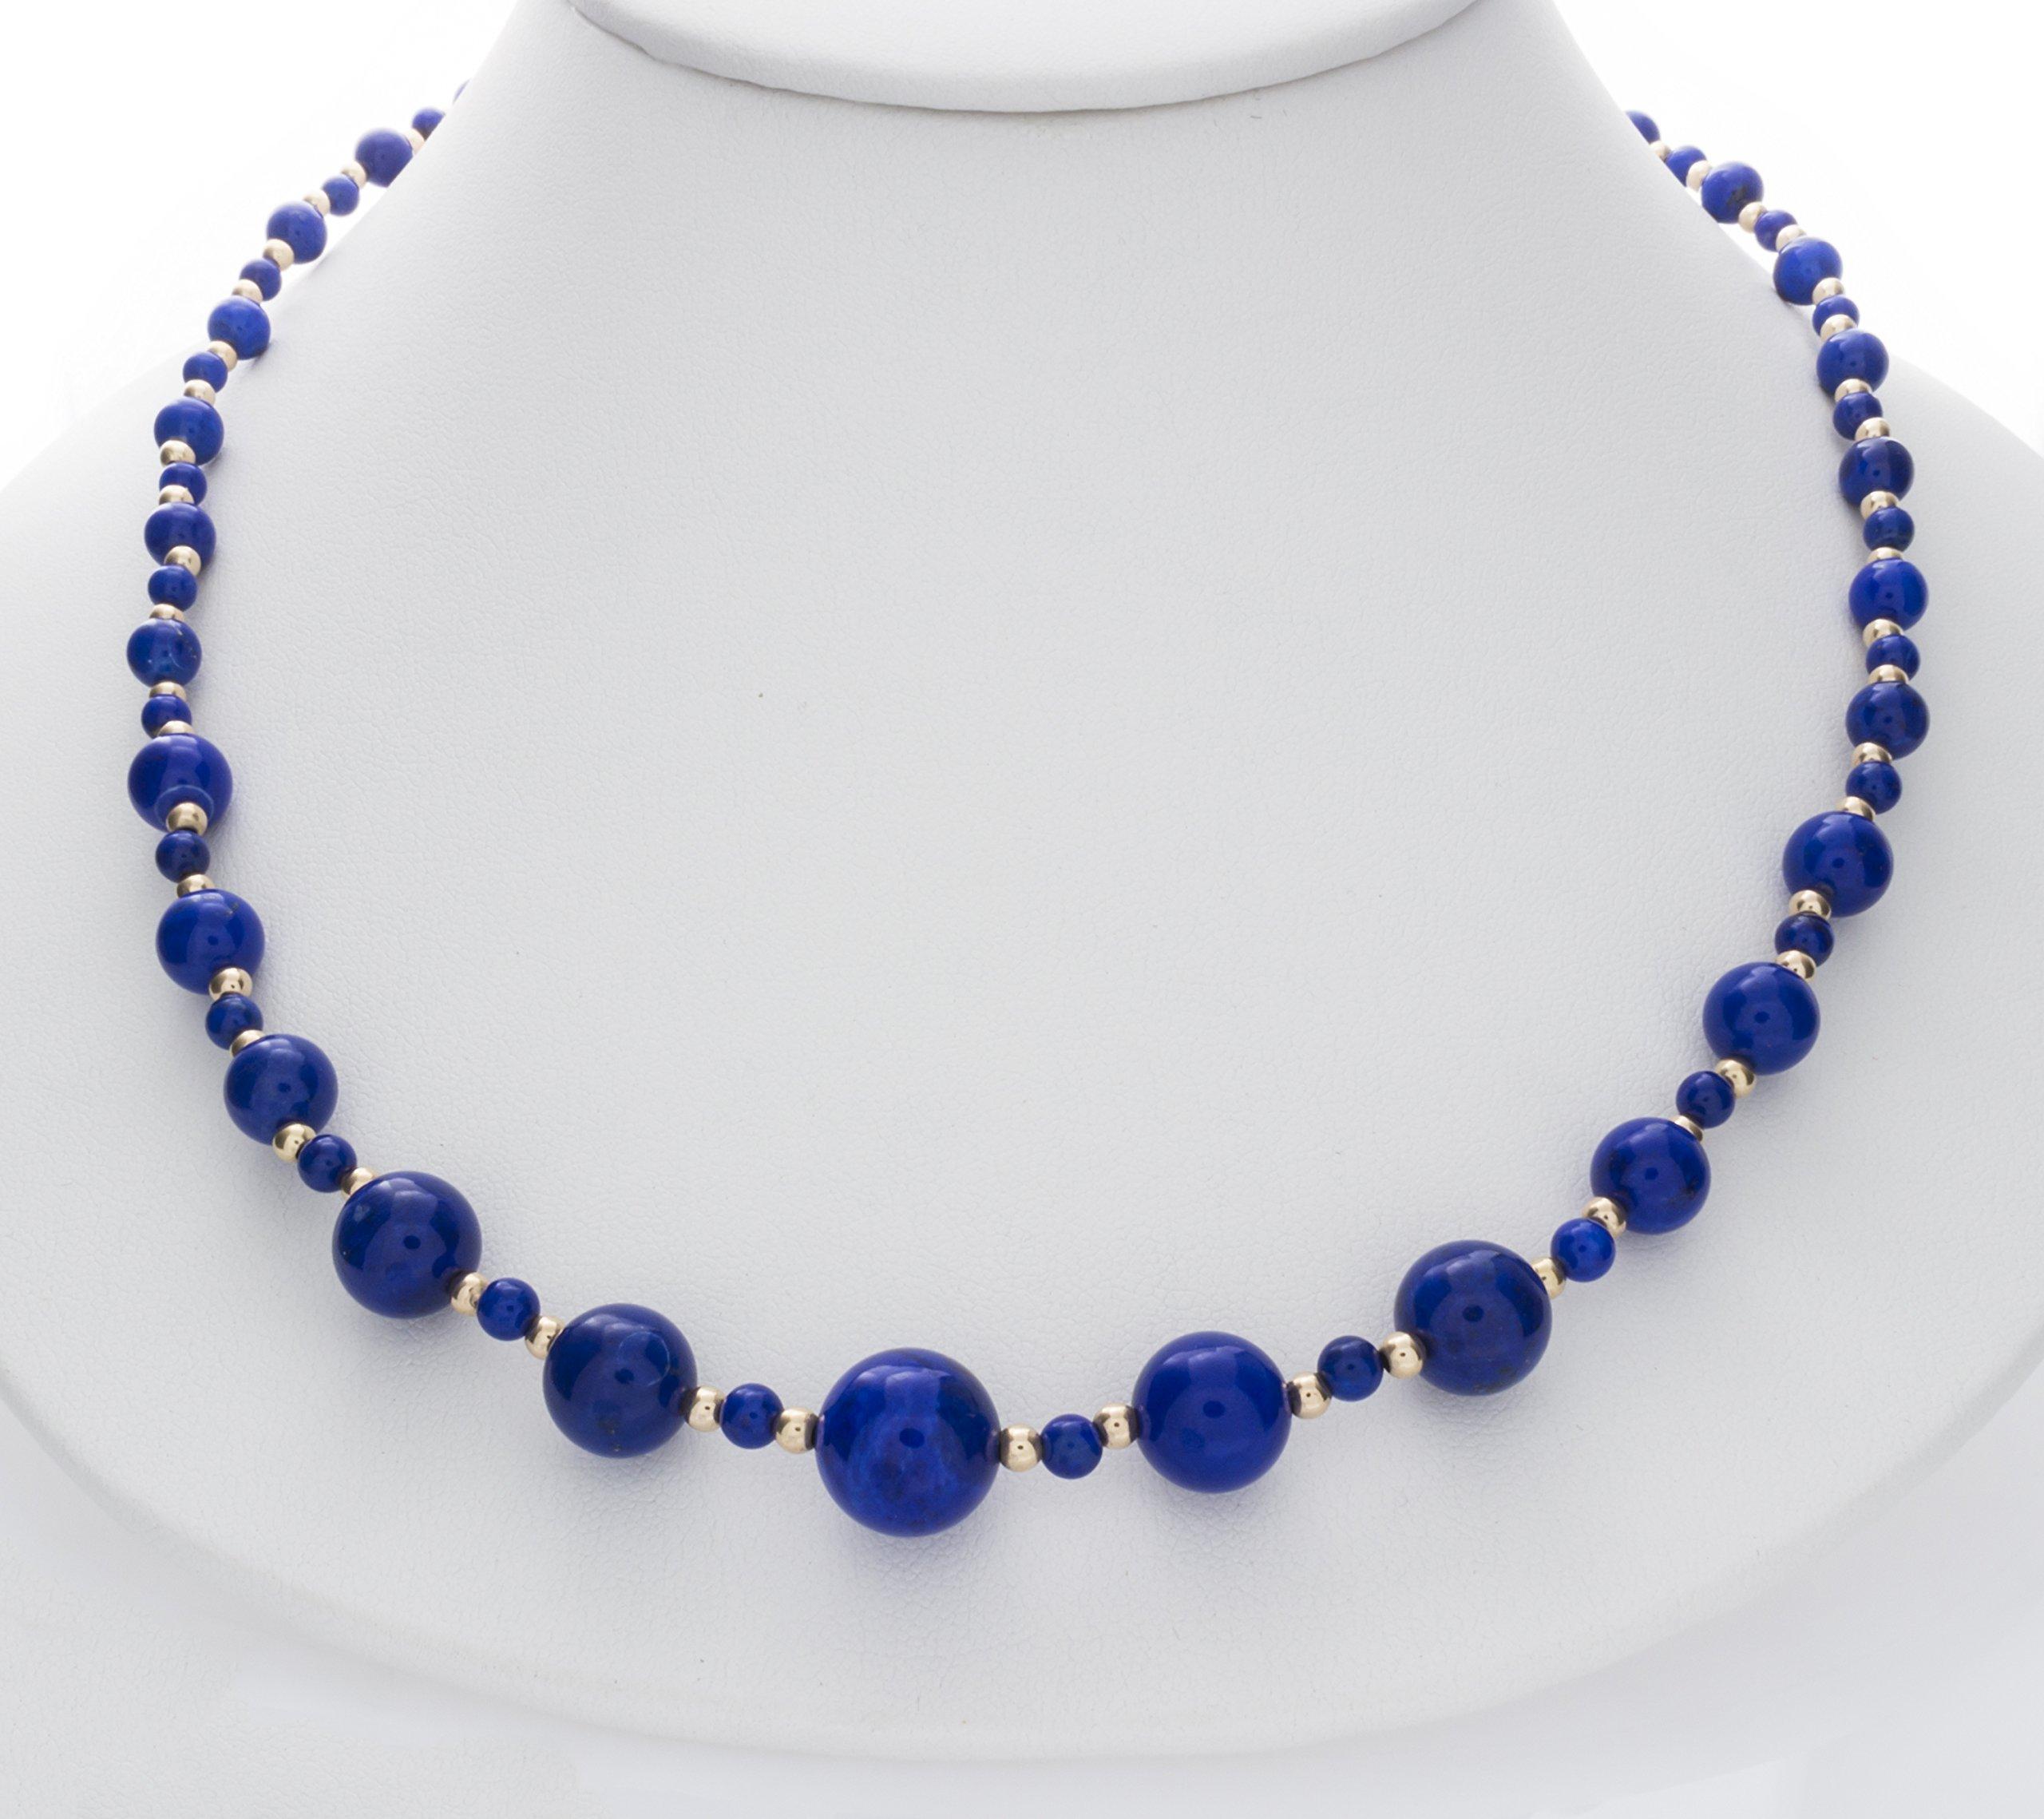 ISAAC WESTMAN 14K Yellow Gold Graduated Lapis Lazuli Gemstone Beaded Necklace | 20'' Matinee Length by ISAAC WESTMAN (Image #2)